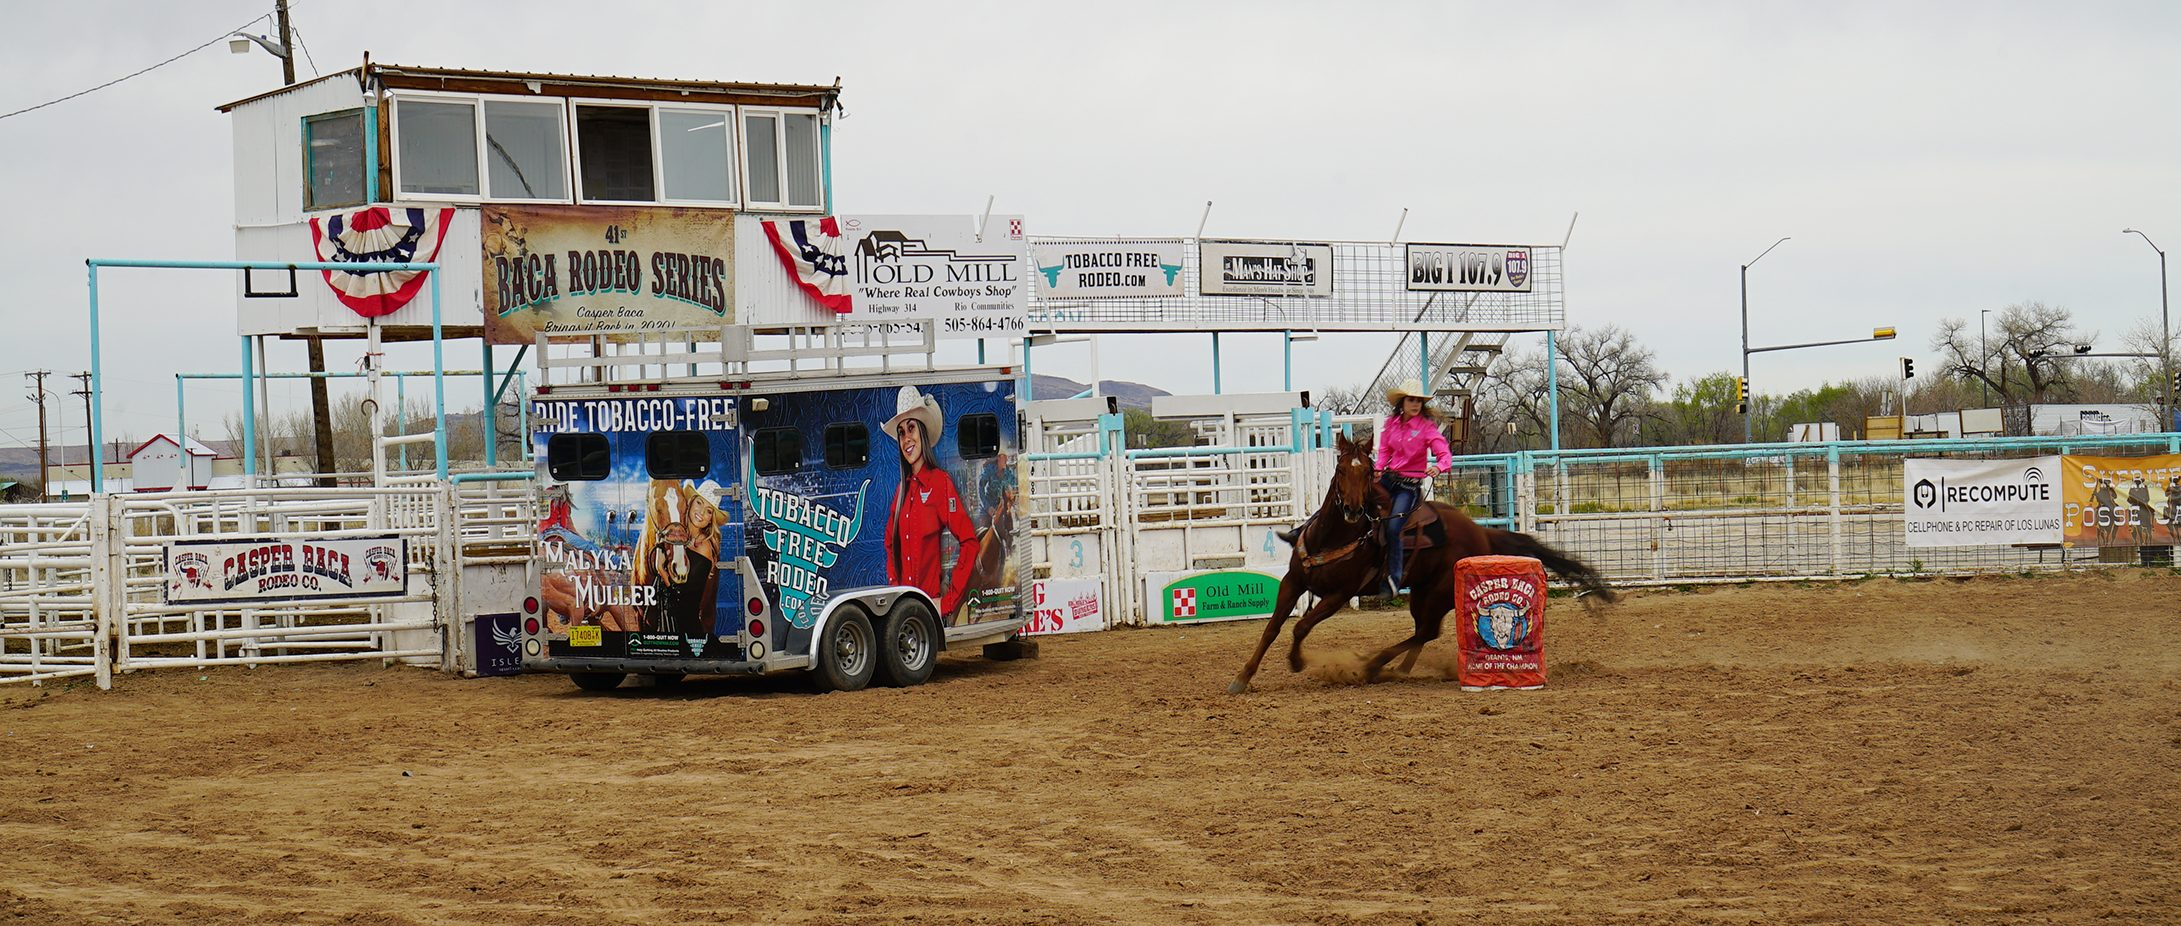 horse rider at rodeo